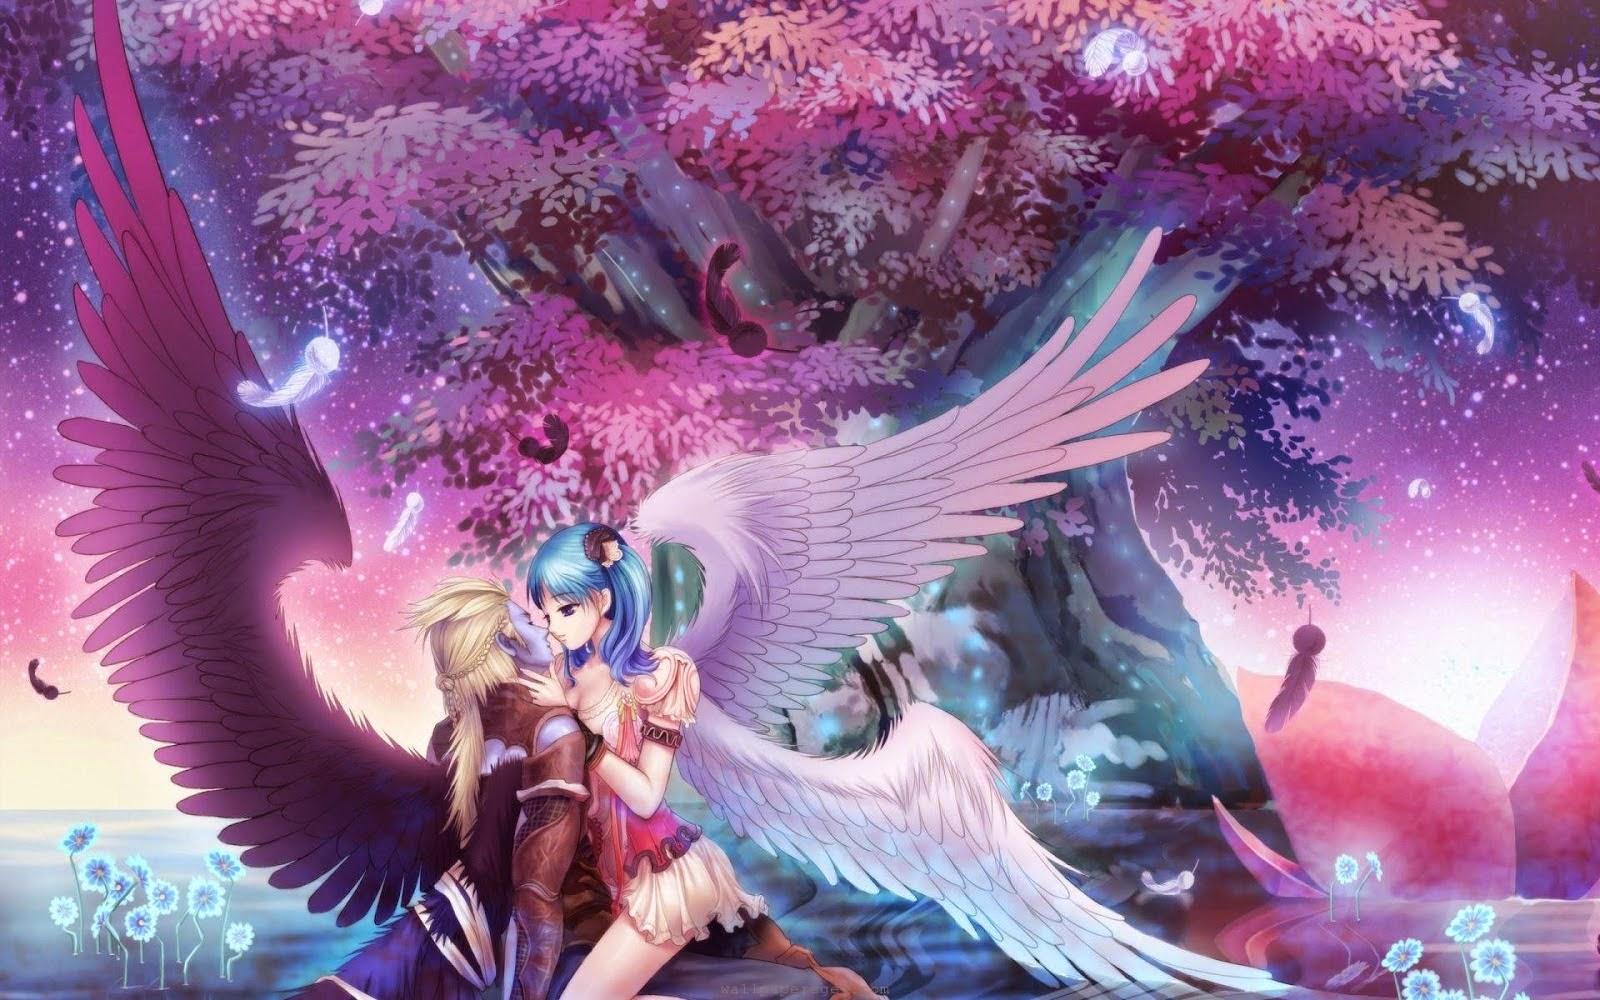 Anime Love HD desktop wallpaper 1920x800